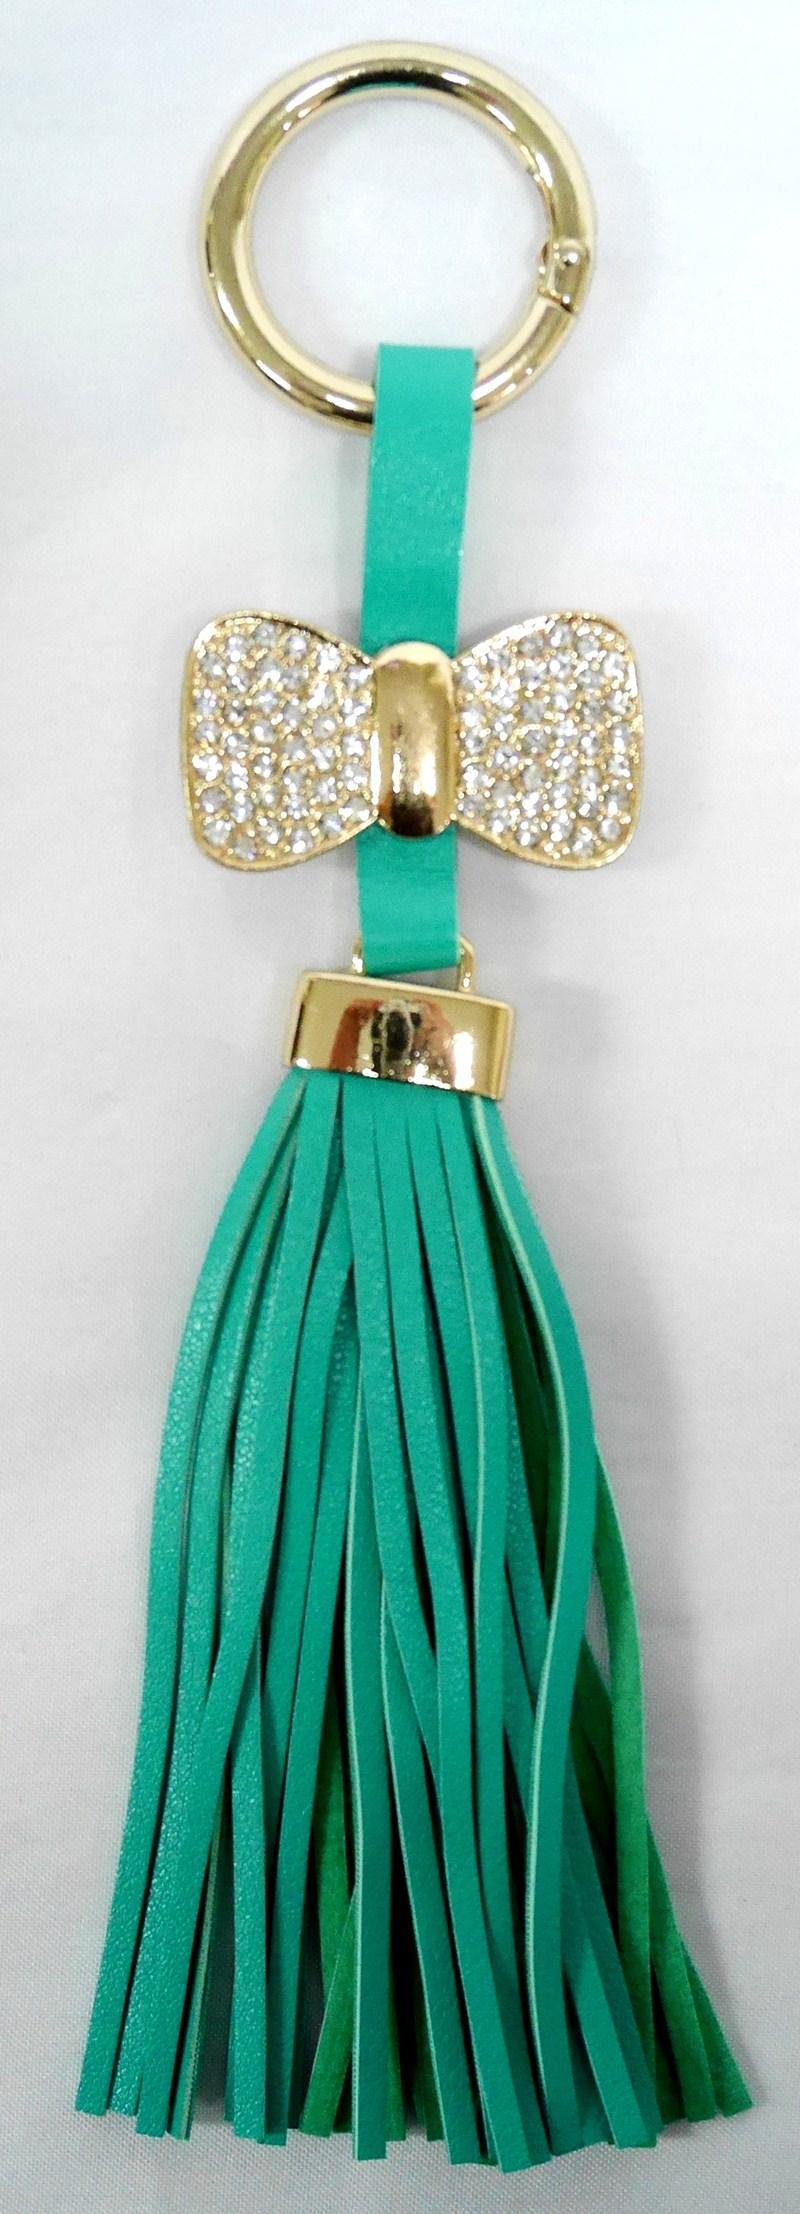 SIV GT RK02 Rumbai Ribbon with Manik Key Chain - Green